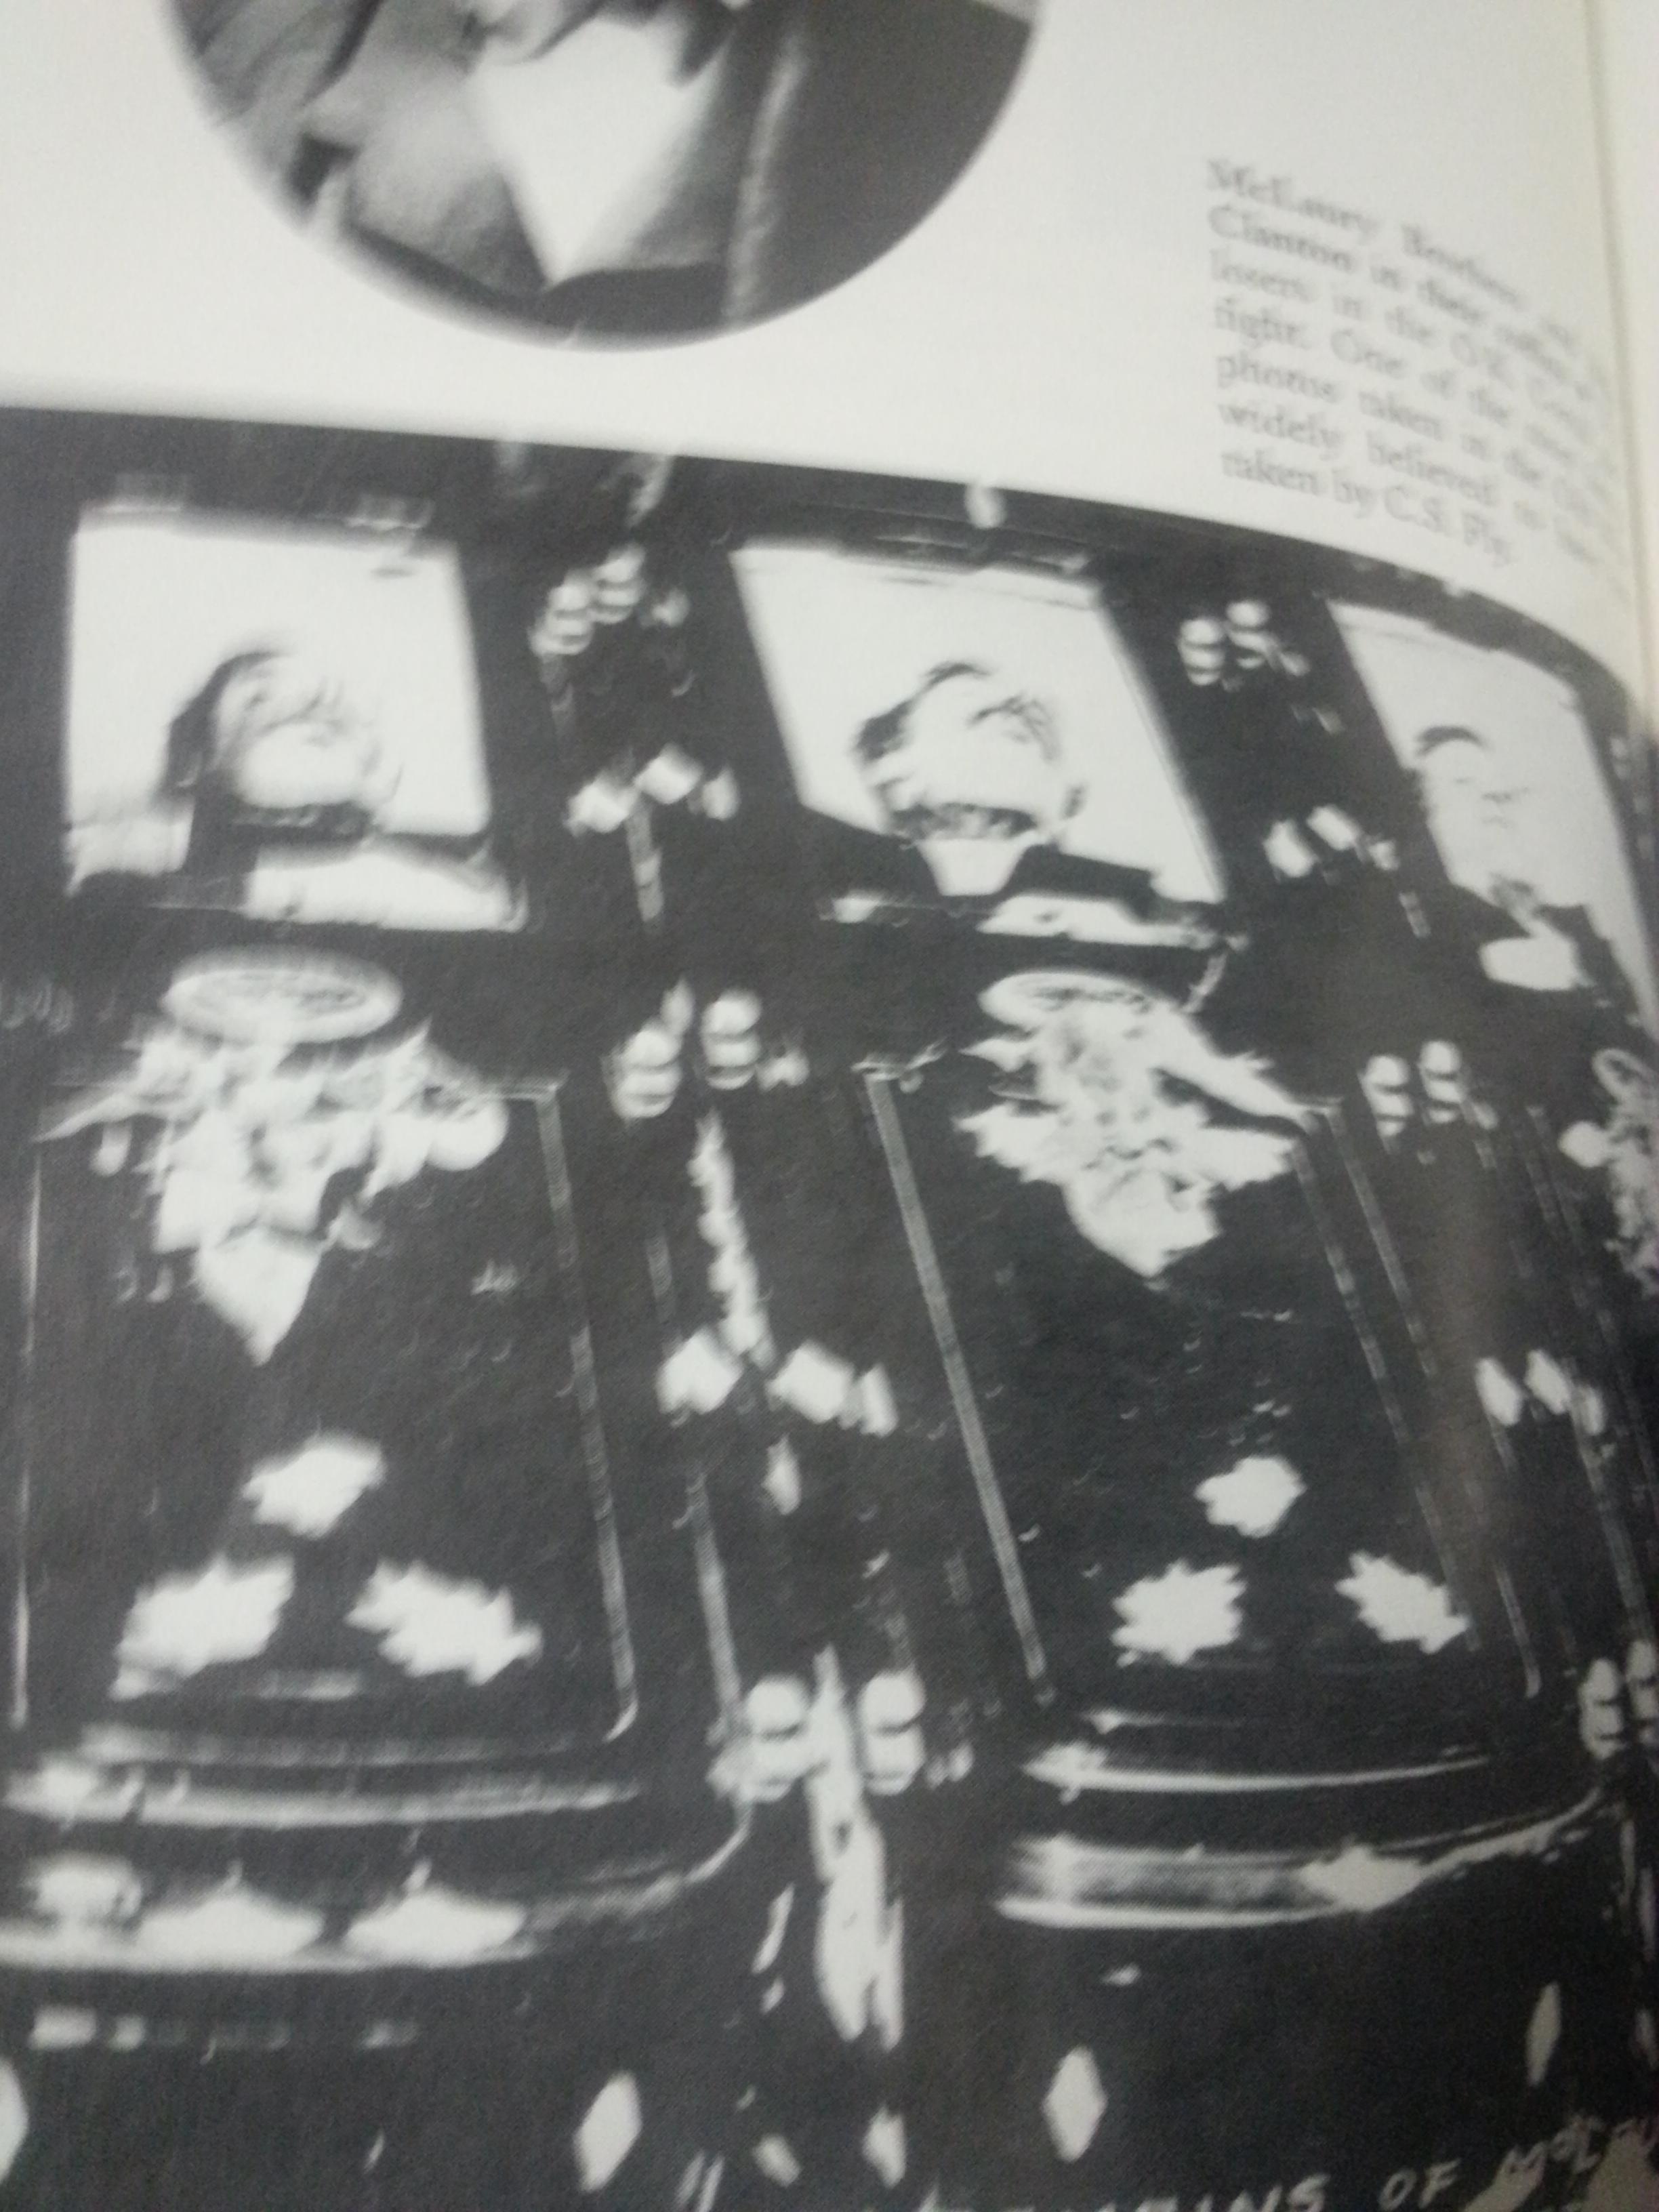 Ike Clanton,Billy Clanton, Tom McLaury,Frank McLaury